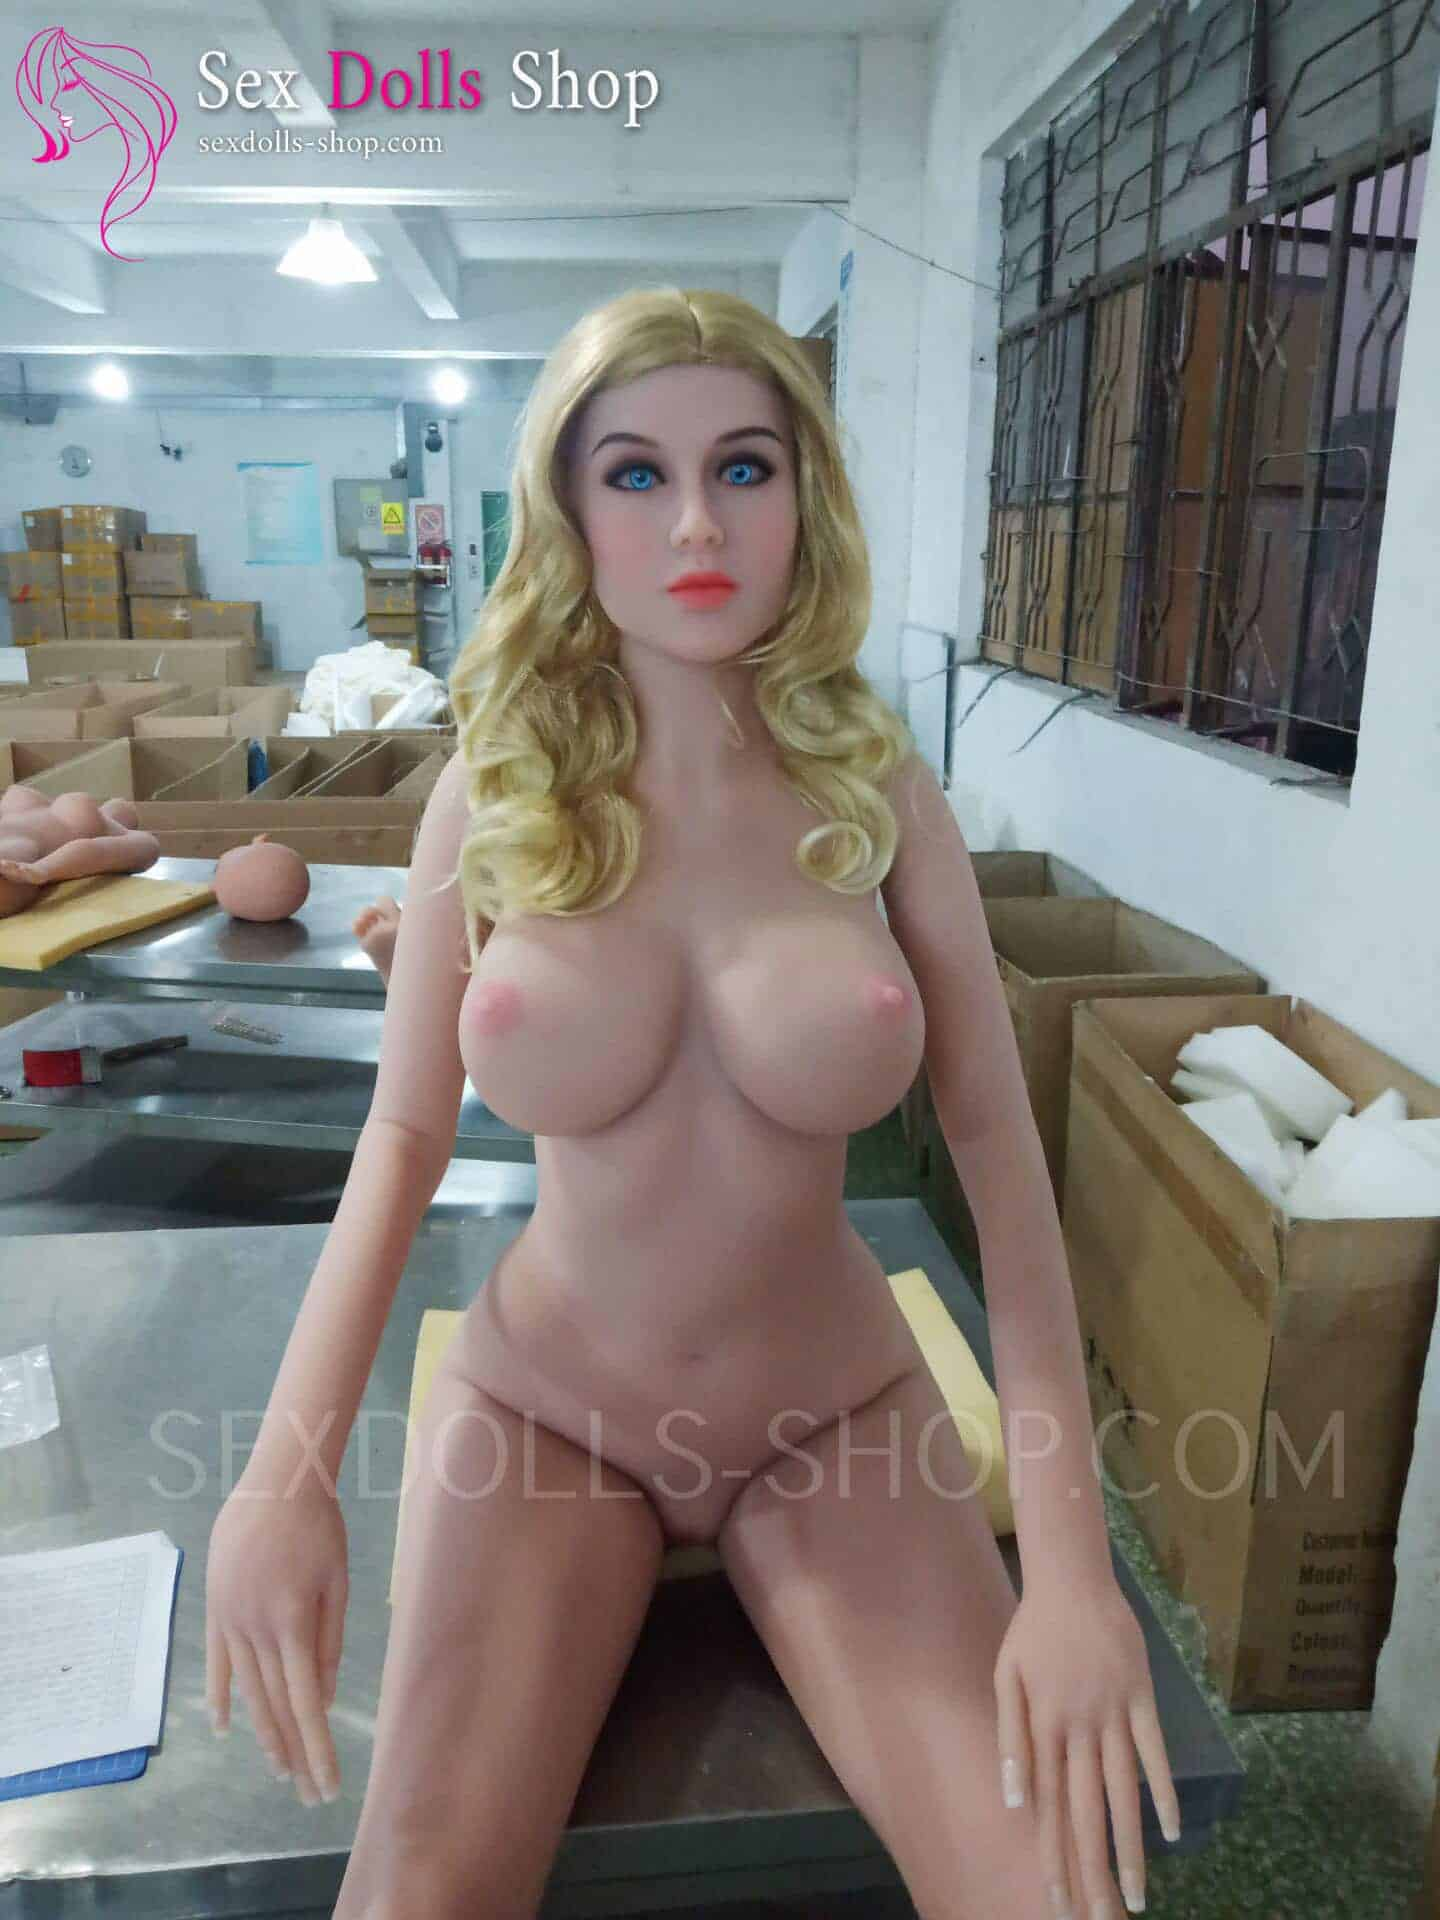 wm 162cm E cup skin medium nipples pink head 15